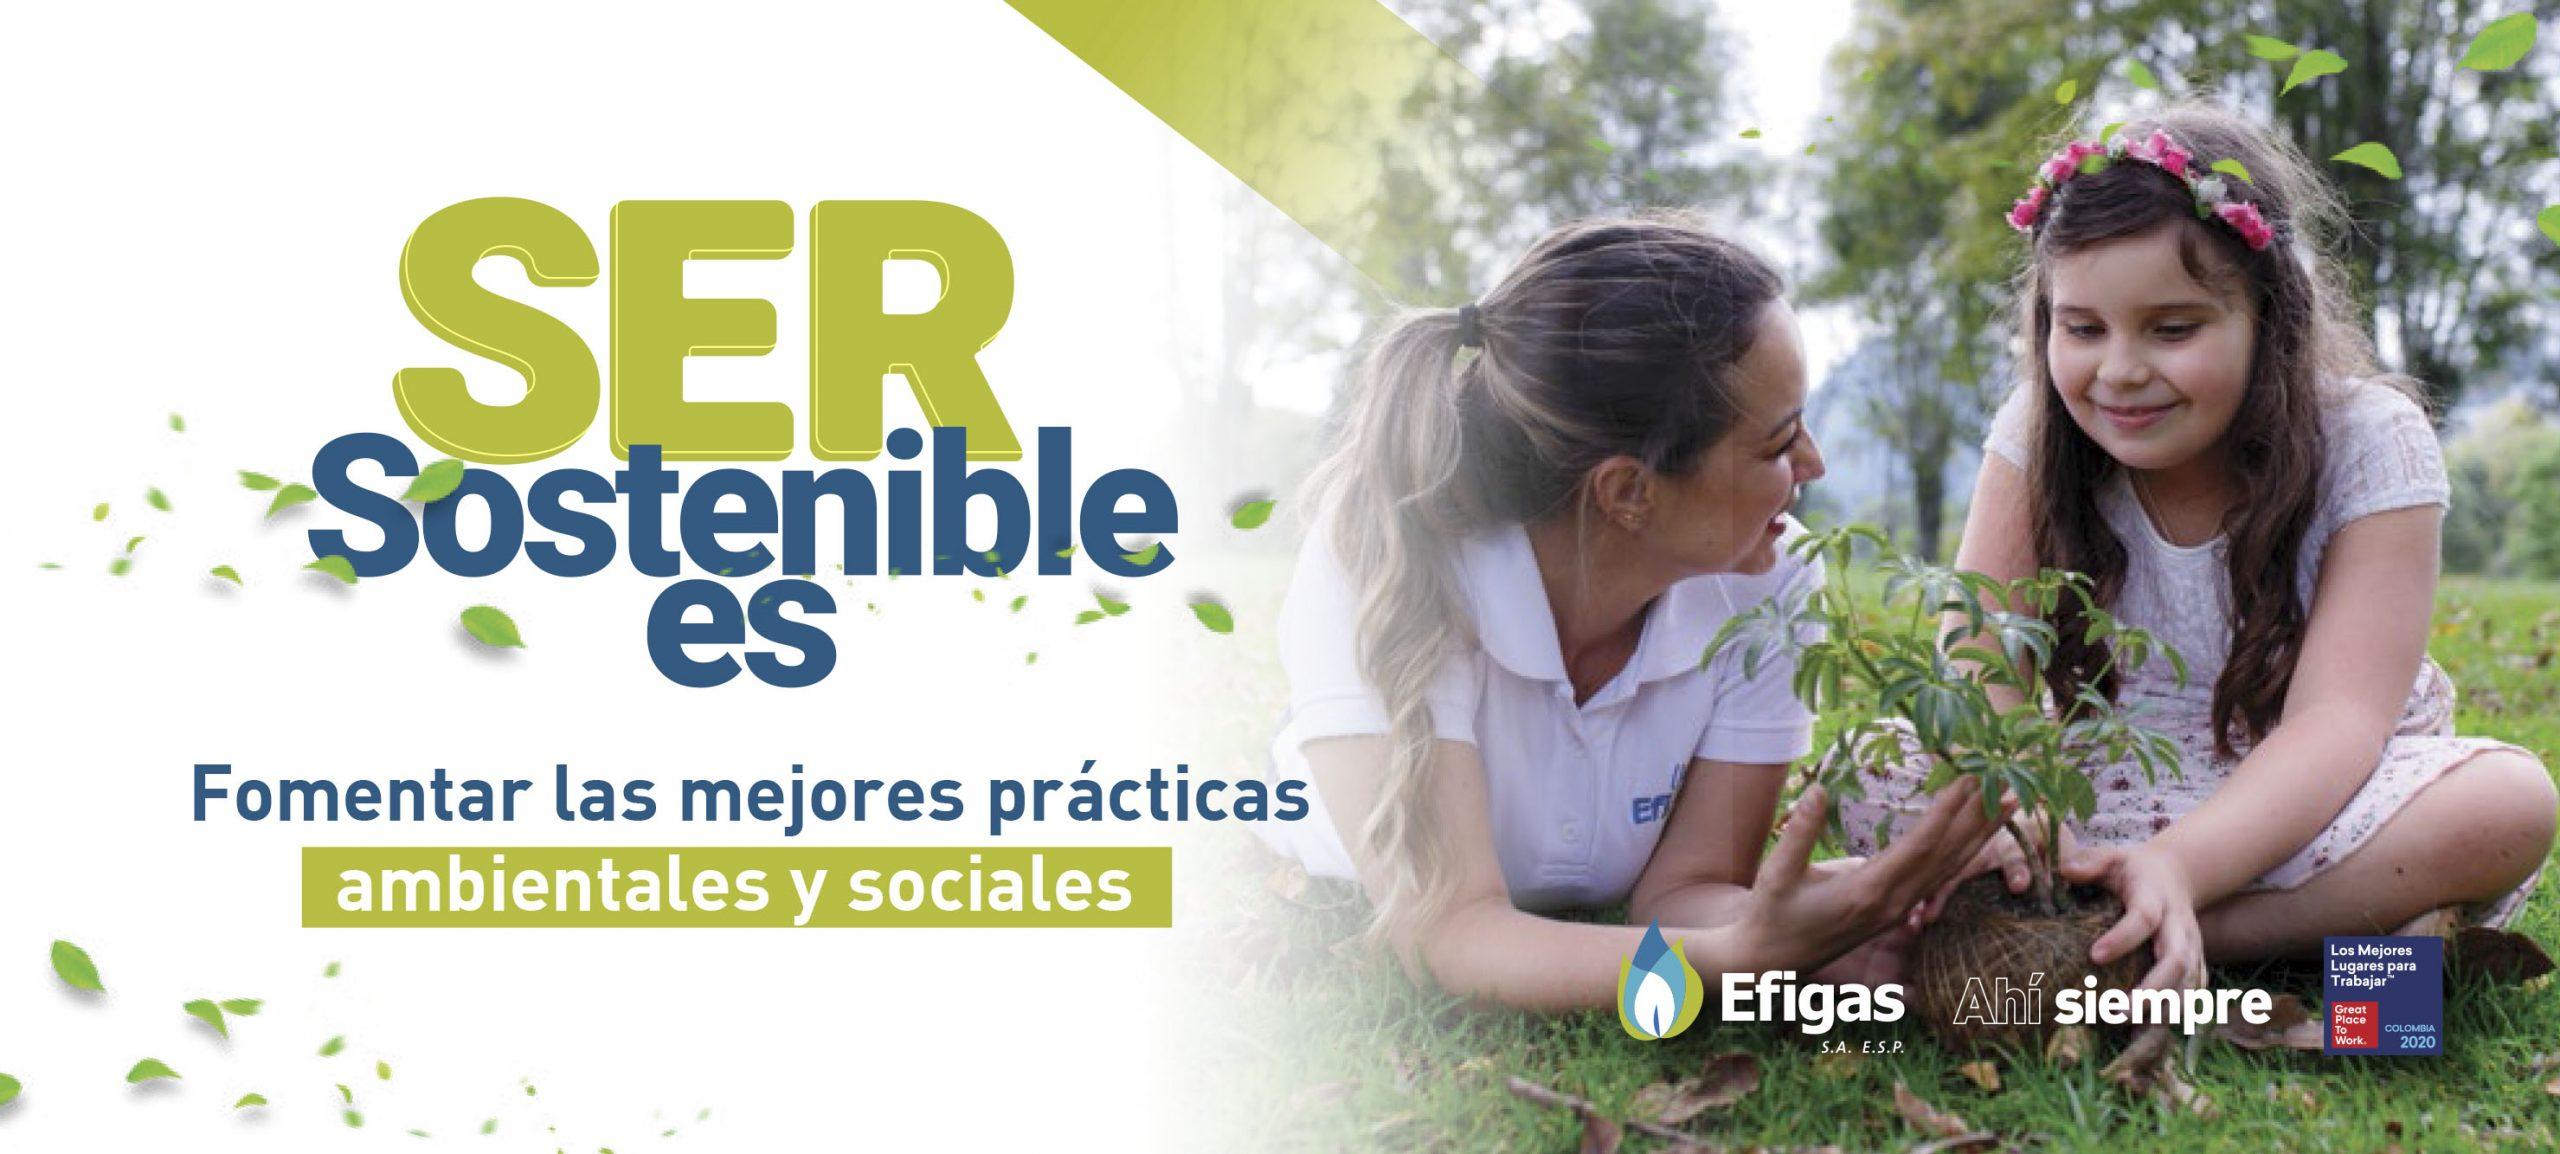 Ser sostenible. Banner def.